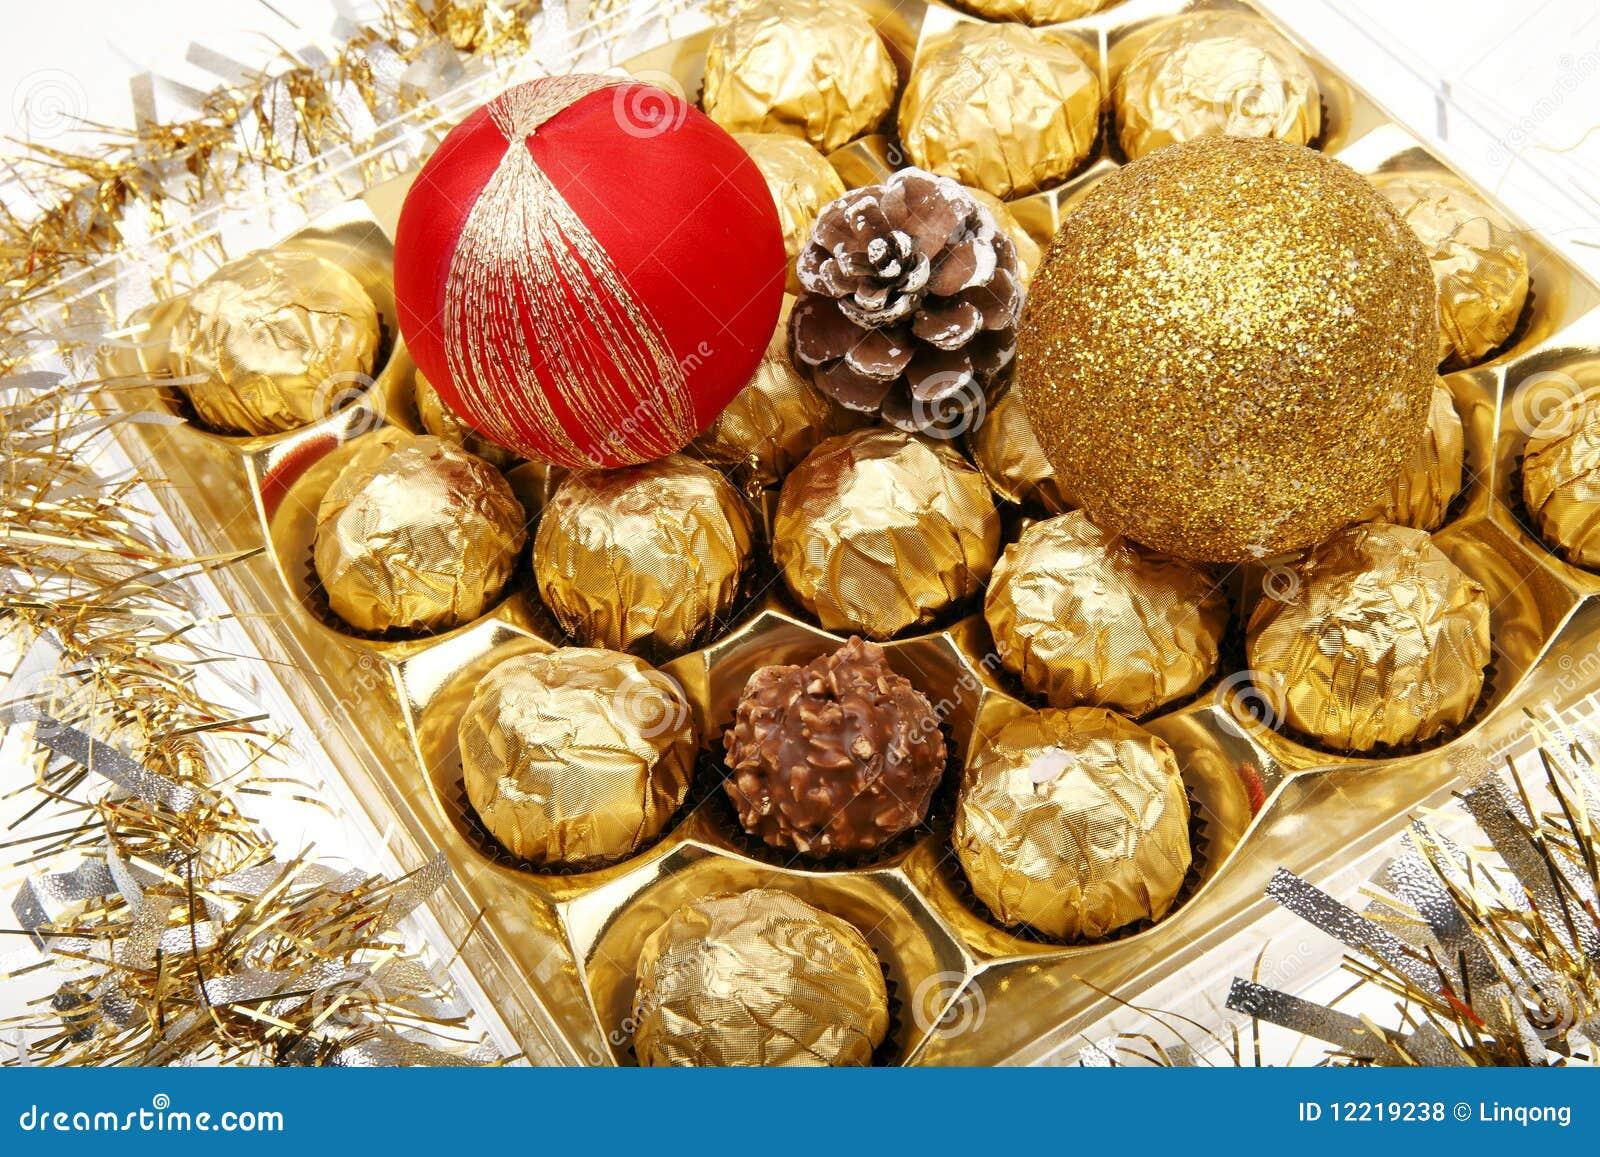 Xmas Chocolate Gift Royalty Free Stock Photos Image